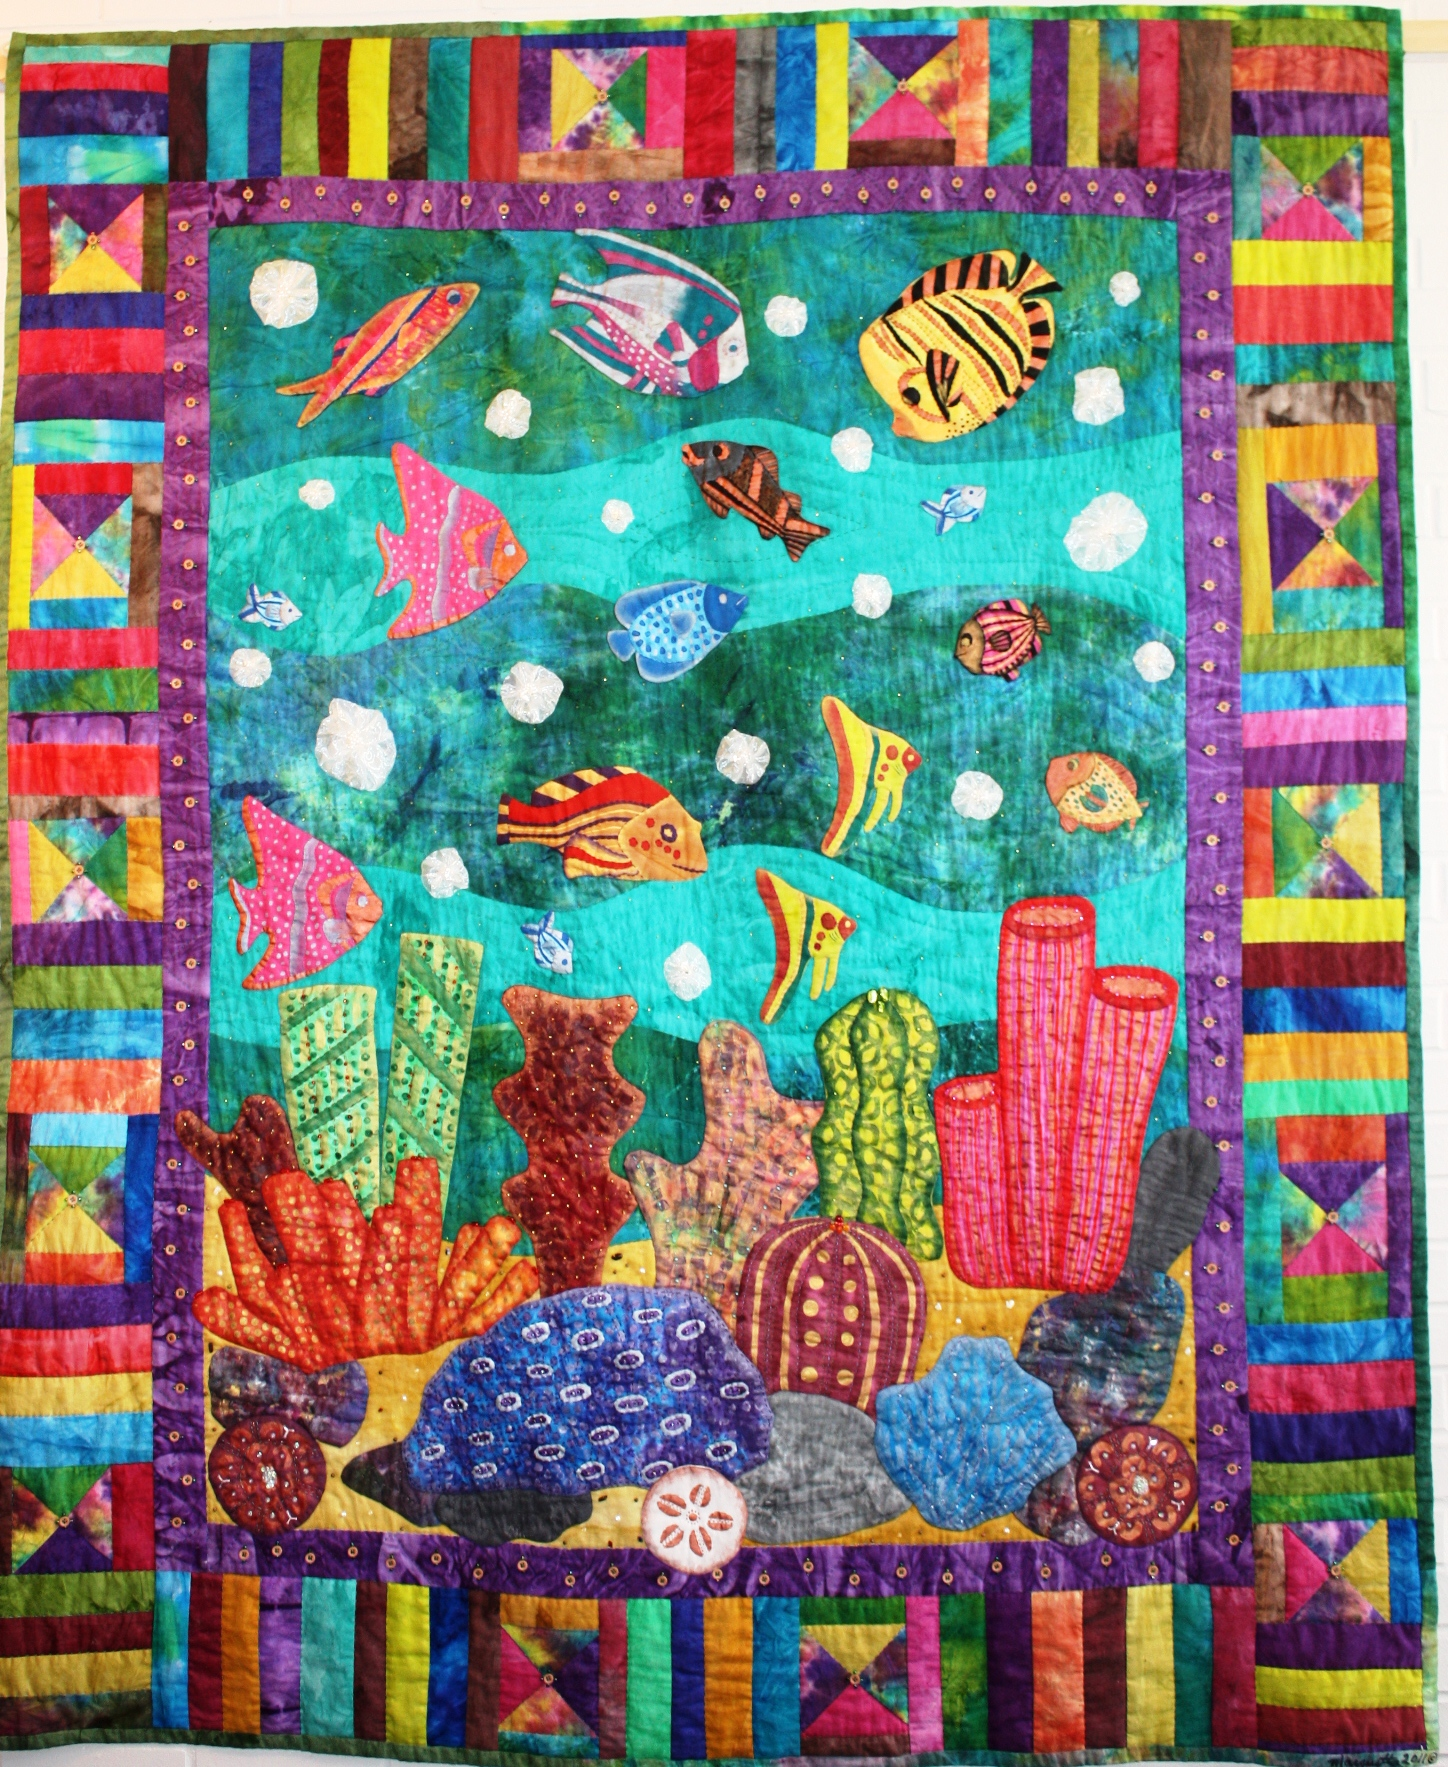 last day to see this quilt in person ocean gardenmarquetta - Ocean Garden